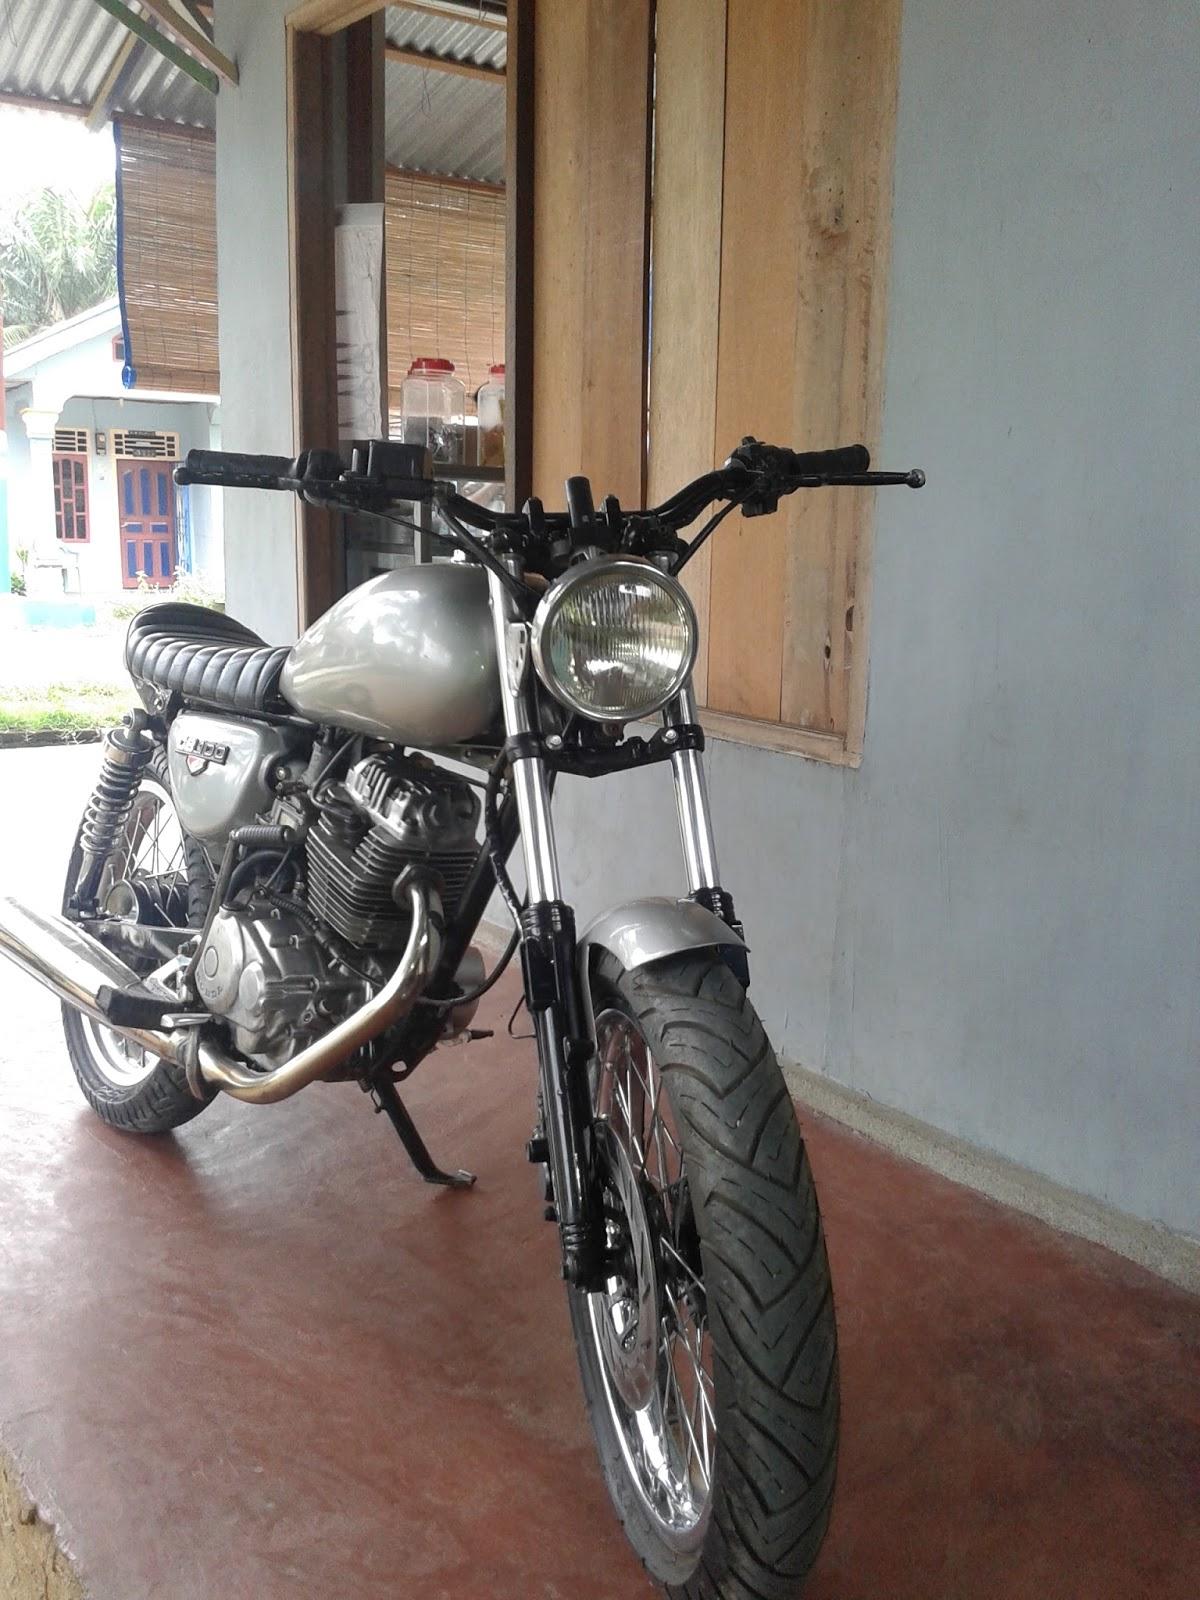 Ktm Semua Tentang Sepeda Motor Cb150 Verza Cash Wheel Macho Silver Bantul Gimana Saya Lumayan Kan D Hehehe